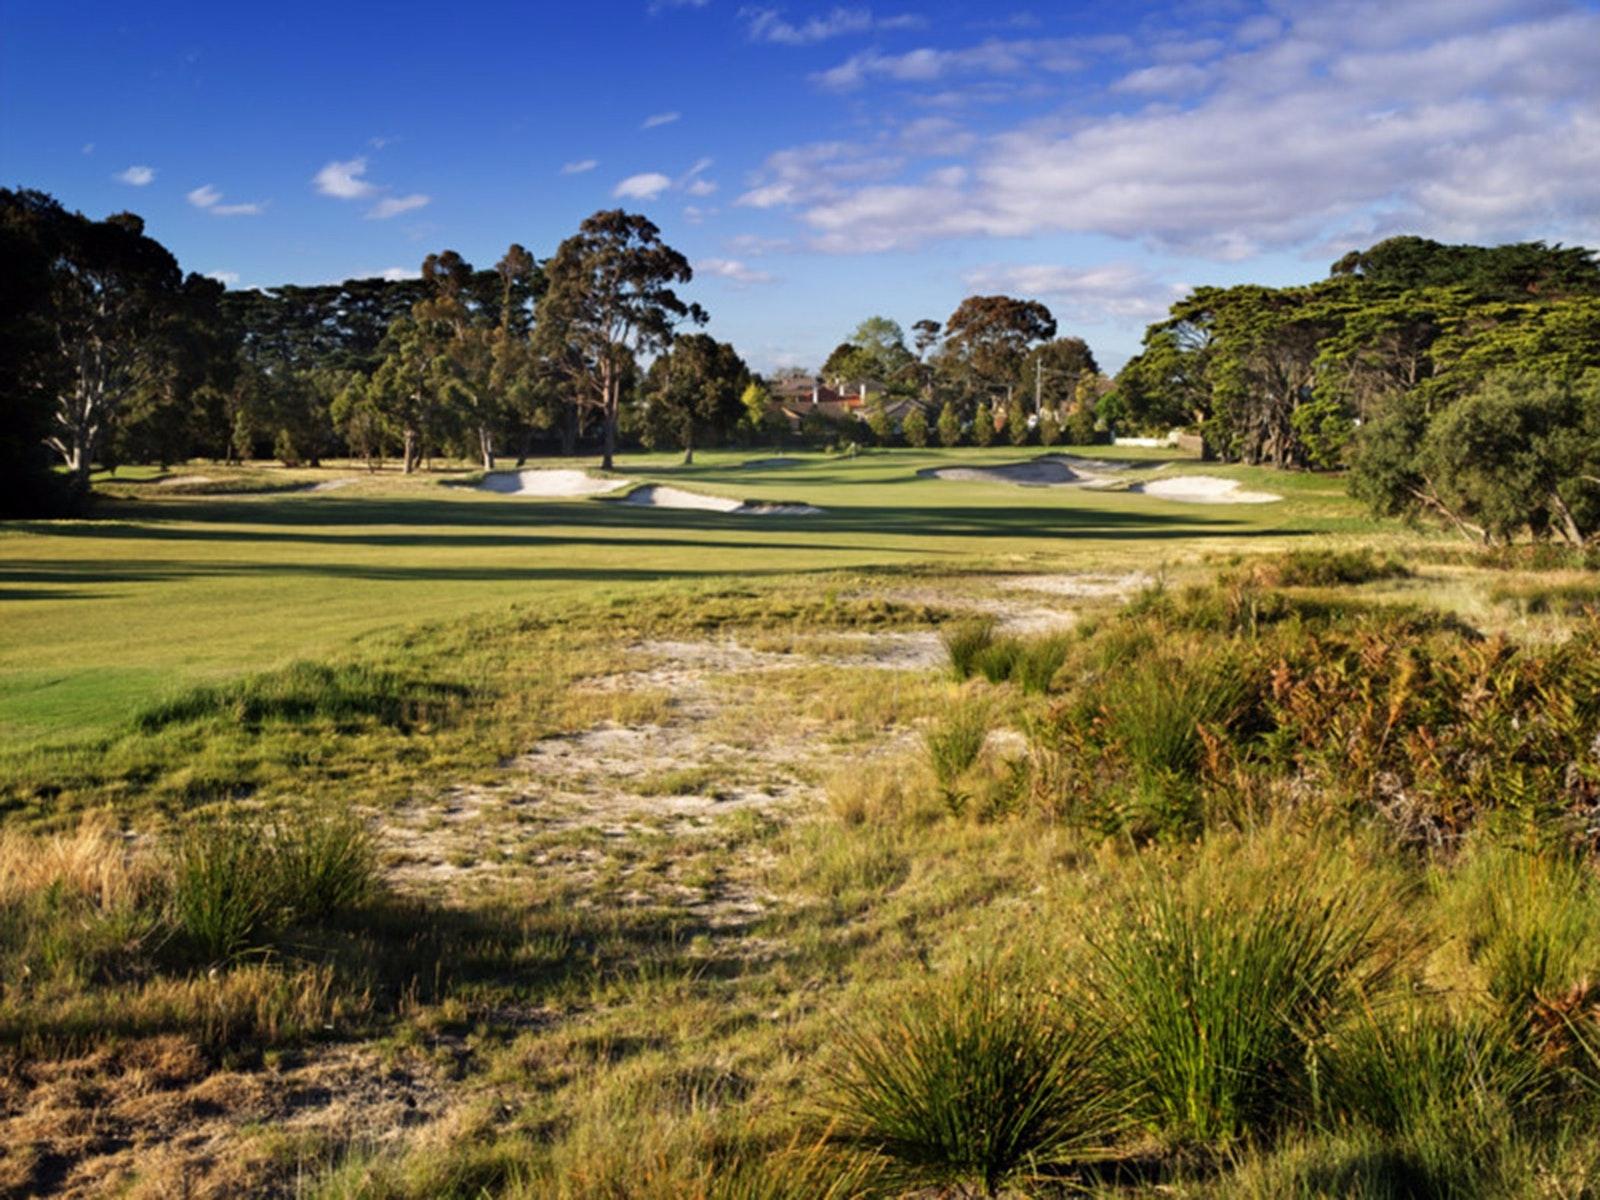 golf outdoor activities victoria australia. Black Bedroom Furniture Sets. Home Design Ideas